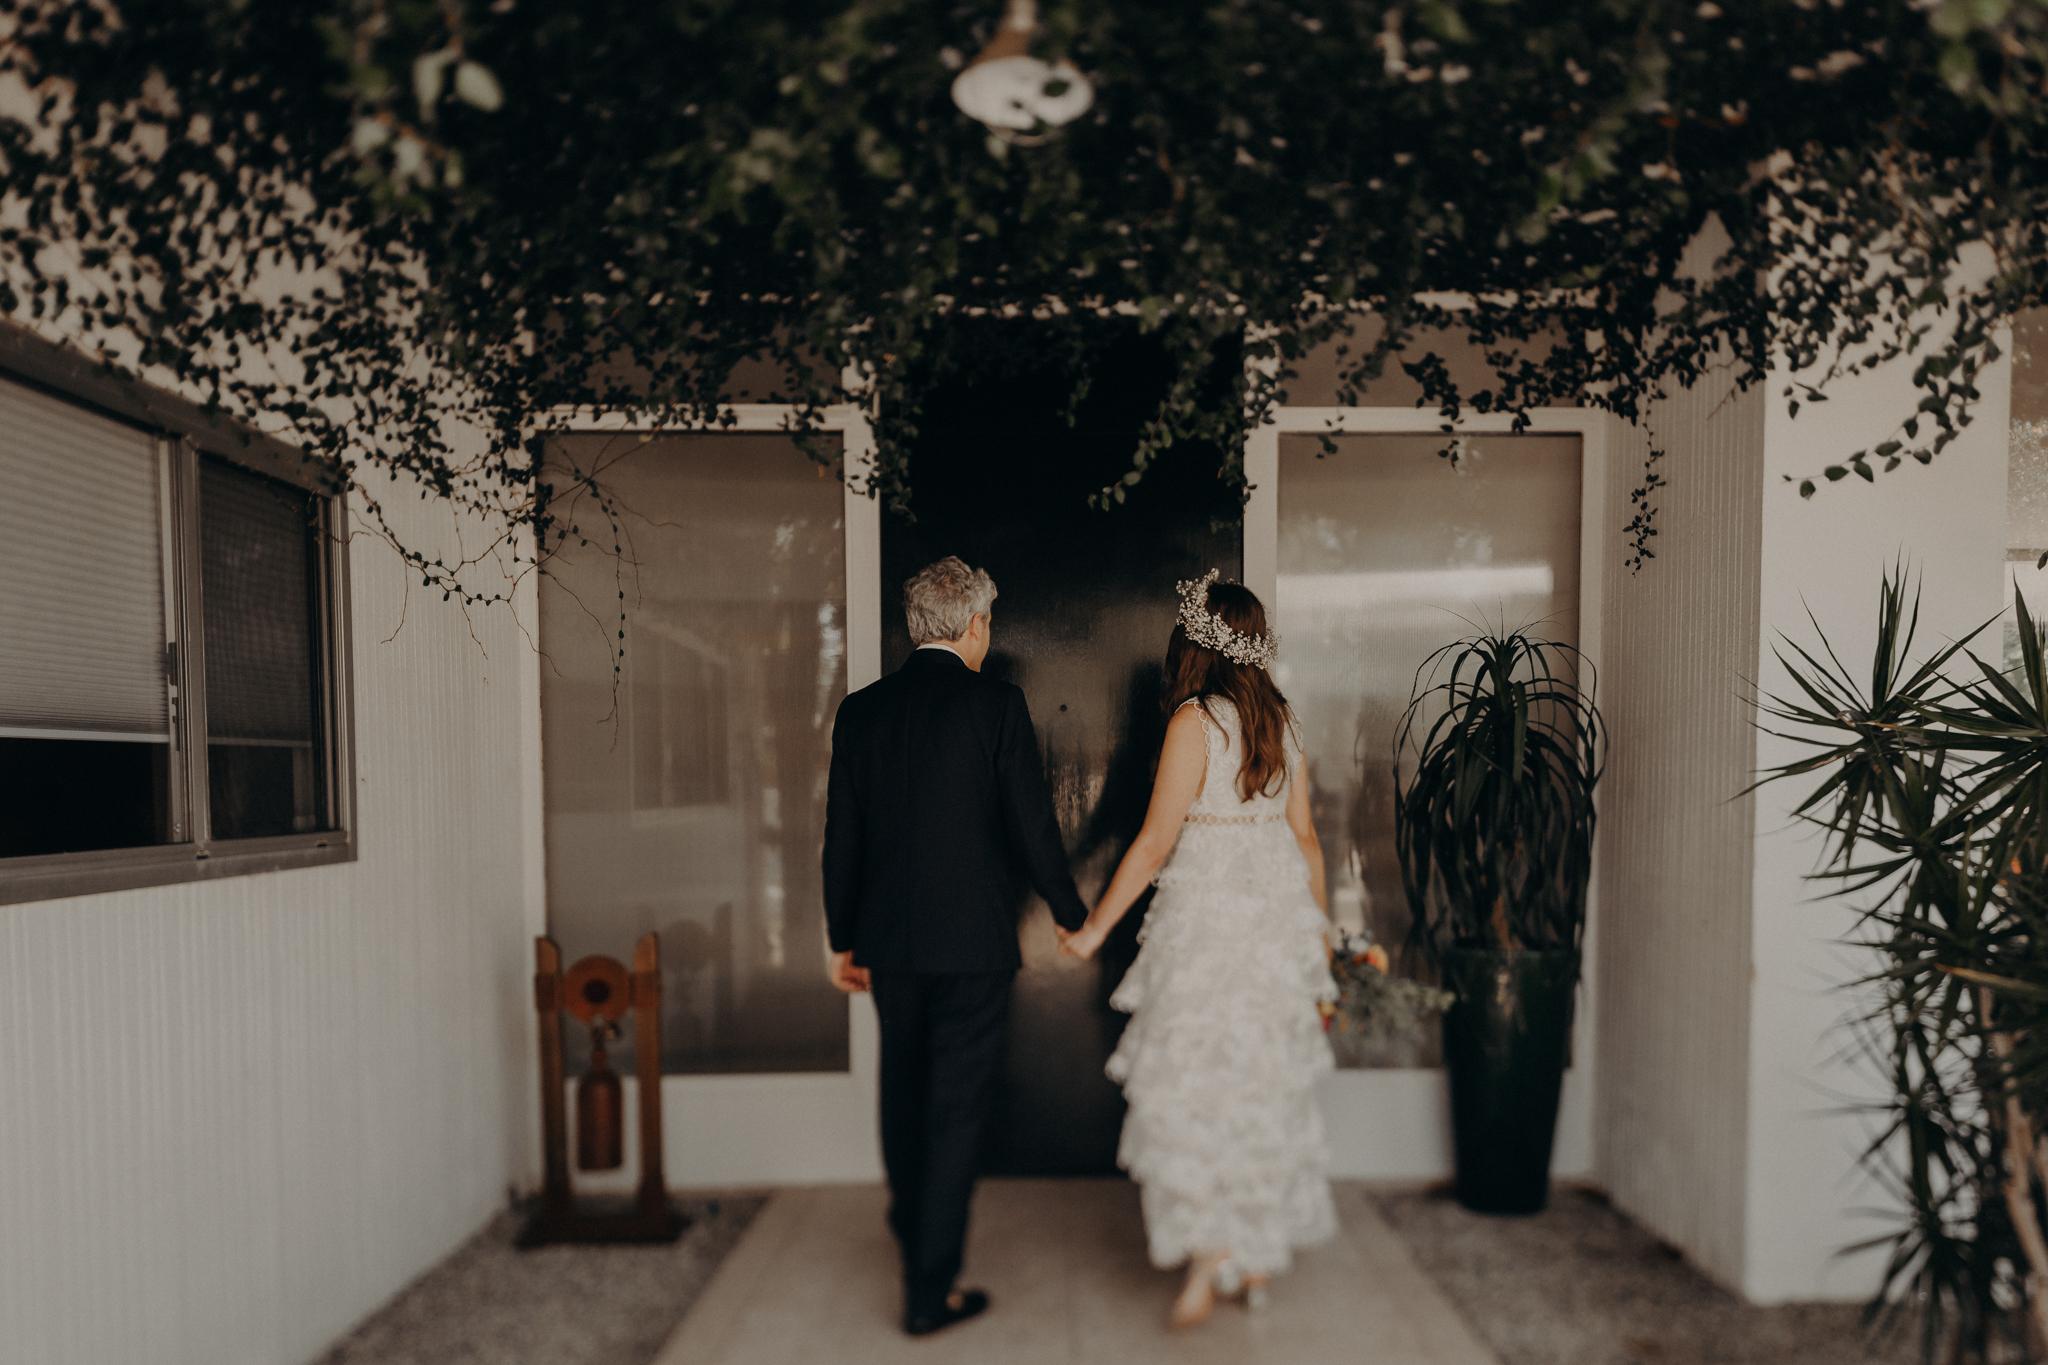 Isaiah + Taylor Photography - Private Estate Backyard Wedding - Beverly Hills - Los Angeles Wedding Photographer - 14.jpg